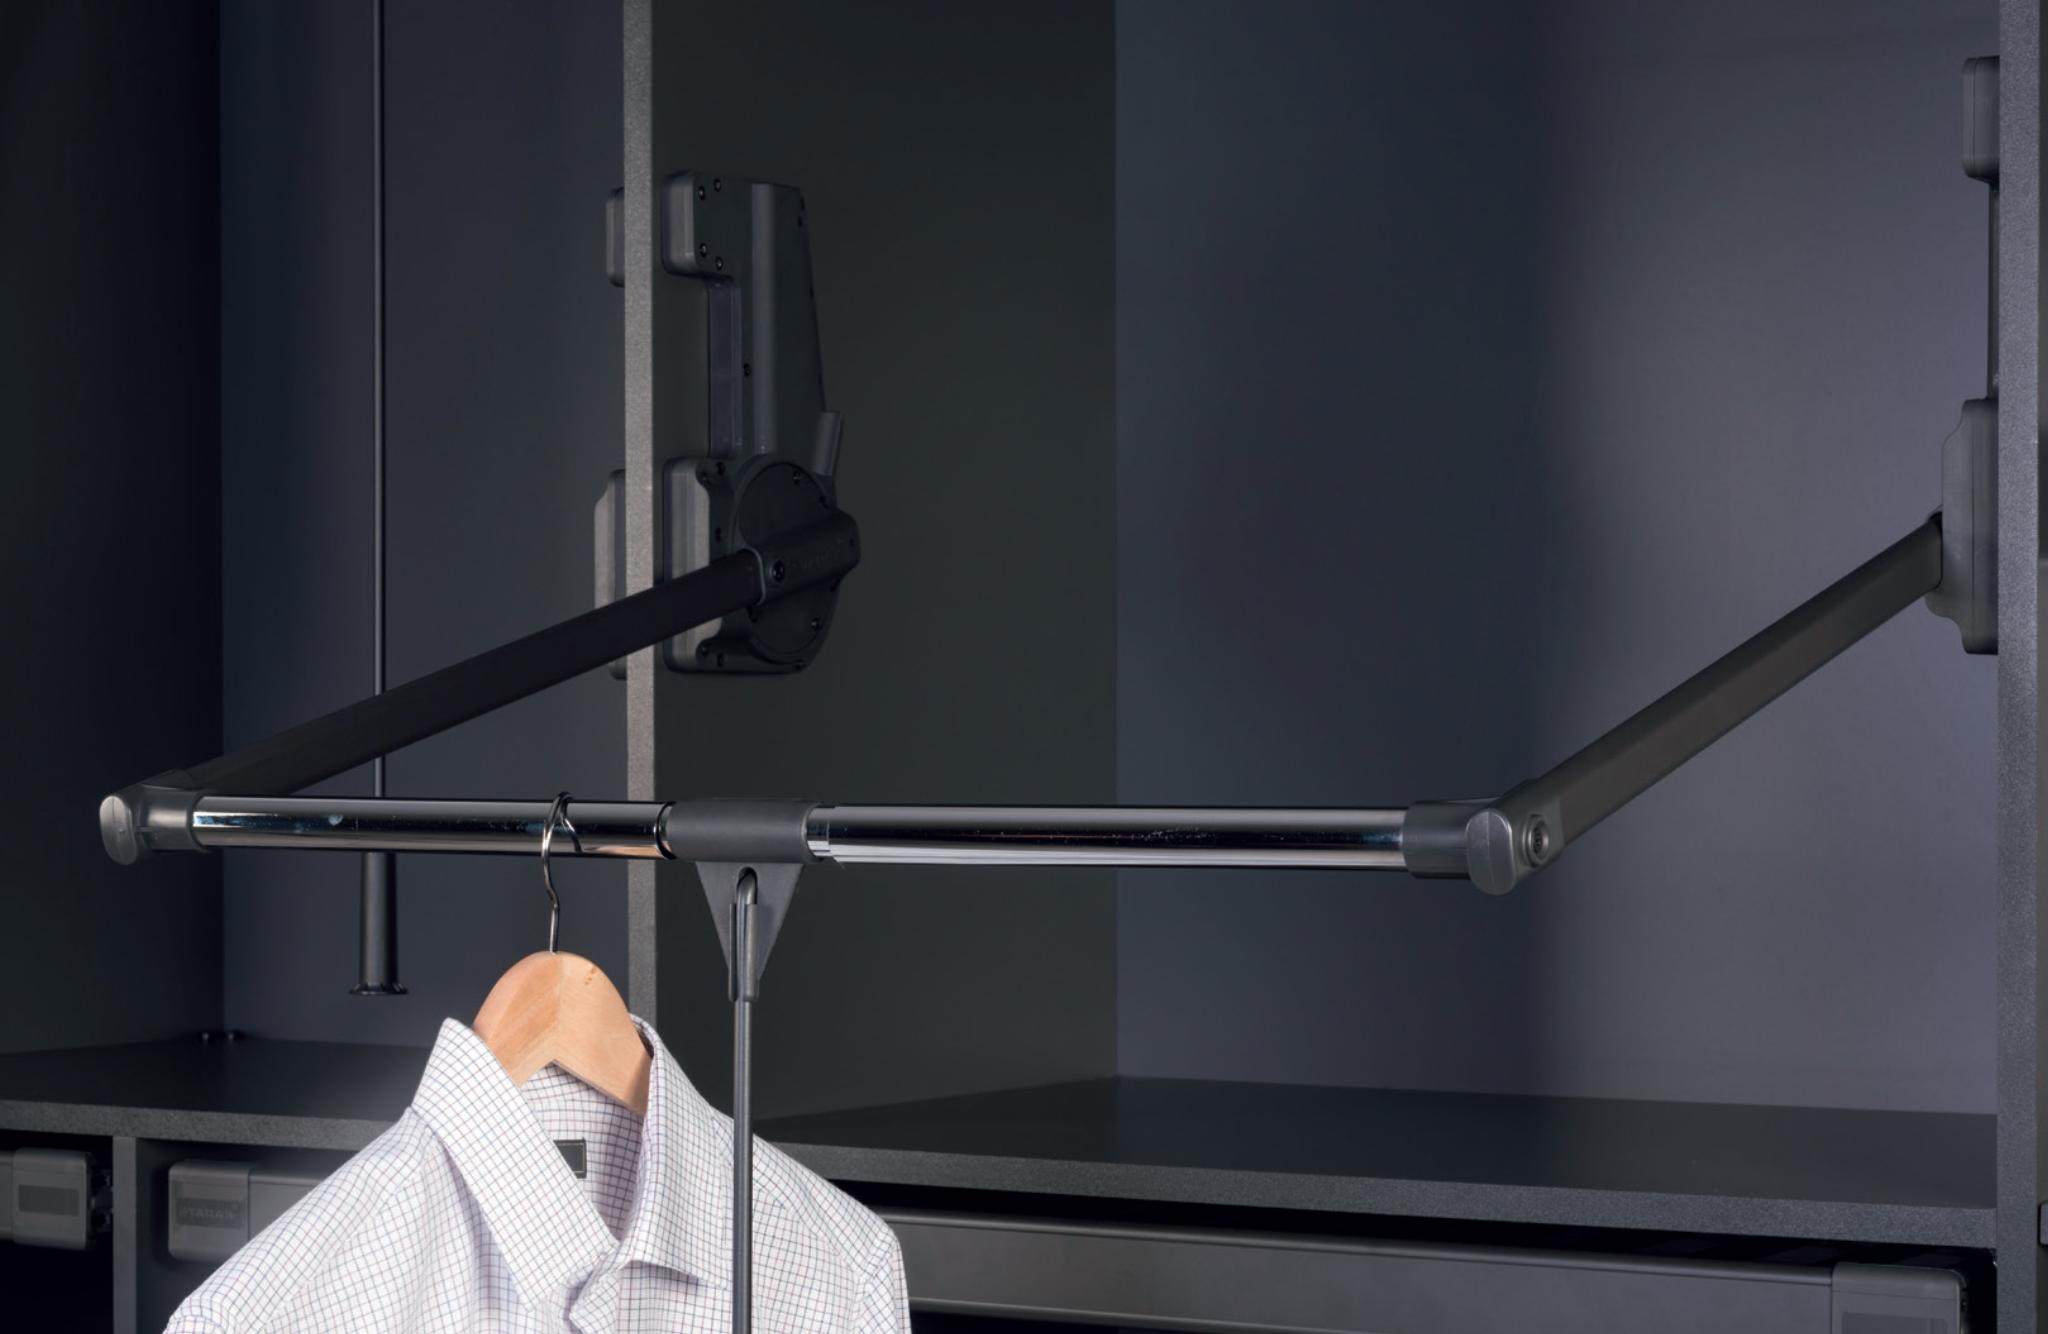 пантограф для шкафа купе